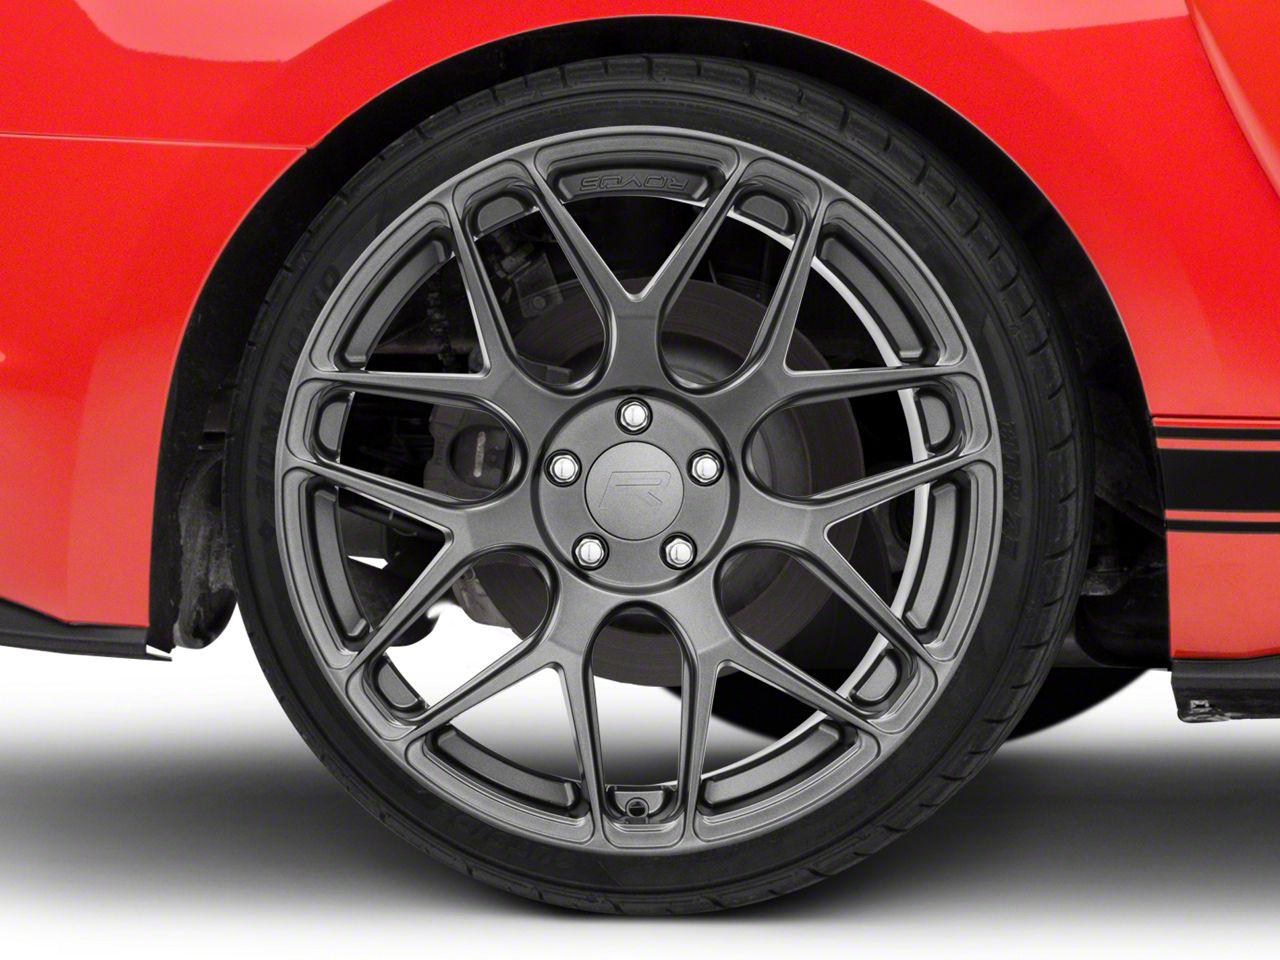 Rovos Pretoria Gunmetal Wheel - 20x10 - Rear Only (15-19 GT, EcoBoost, V6)